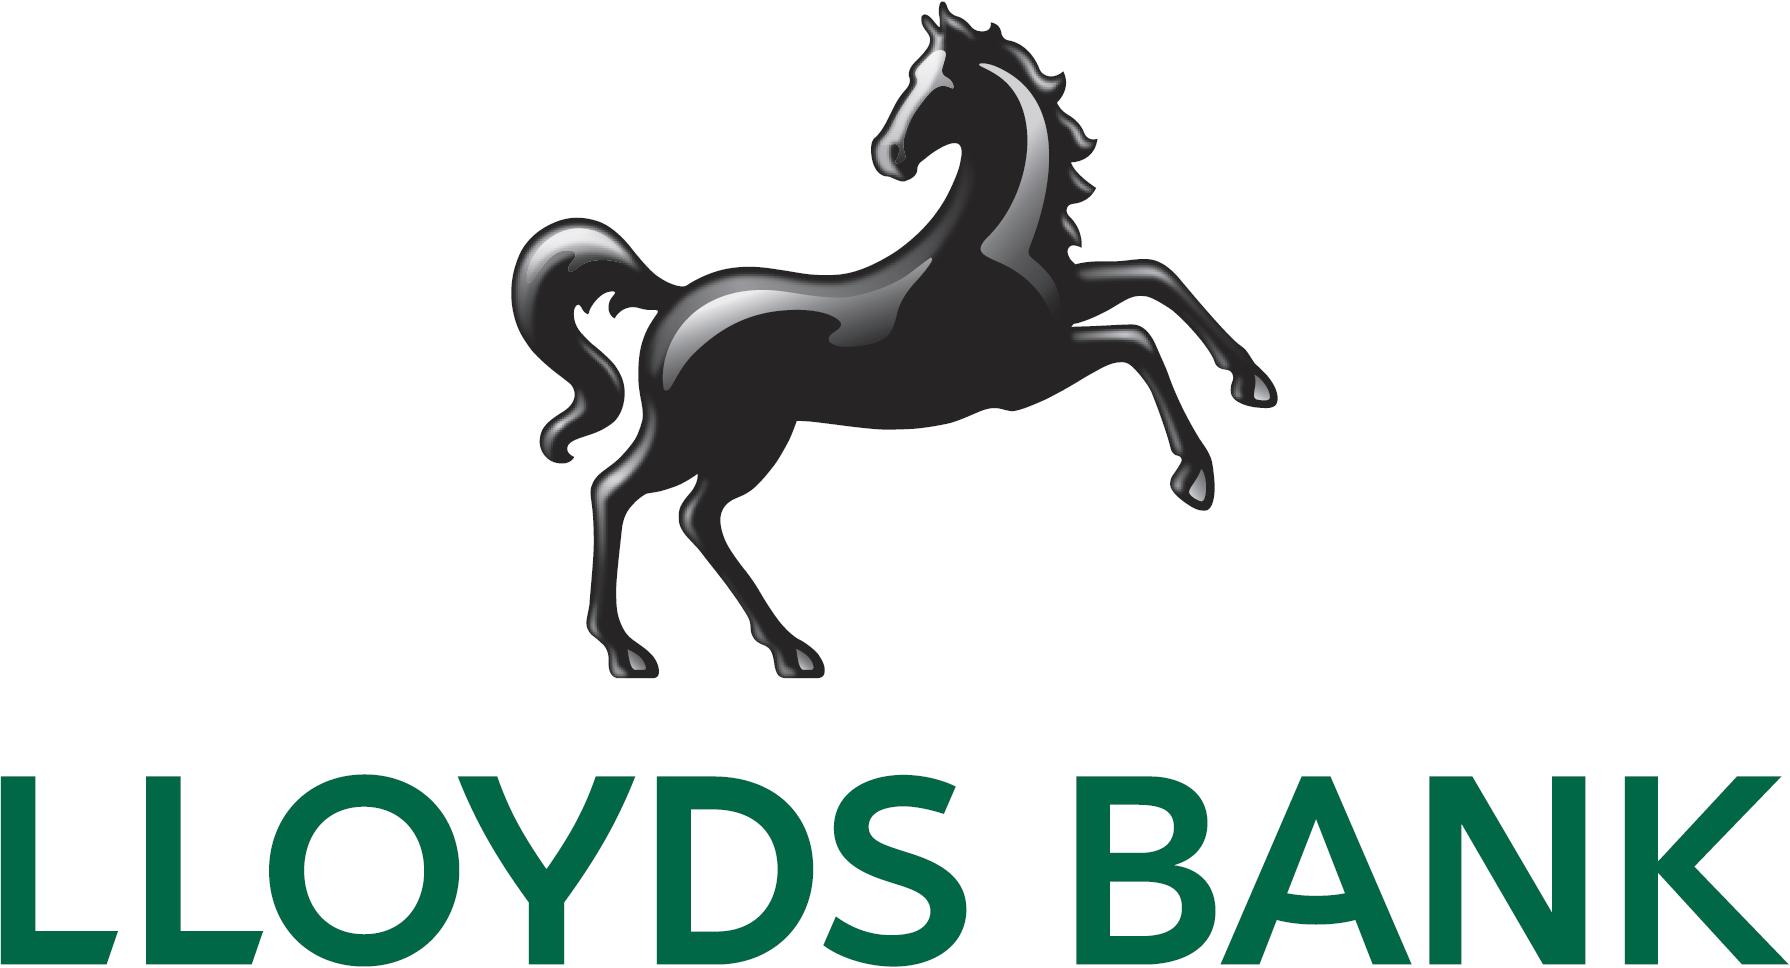 Lloyds bank loans in depth info reviews choose wisely lloyds bank loans colourmoves